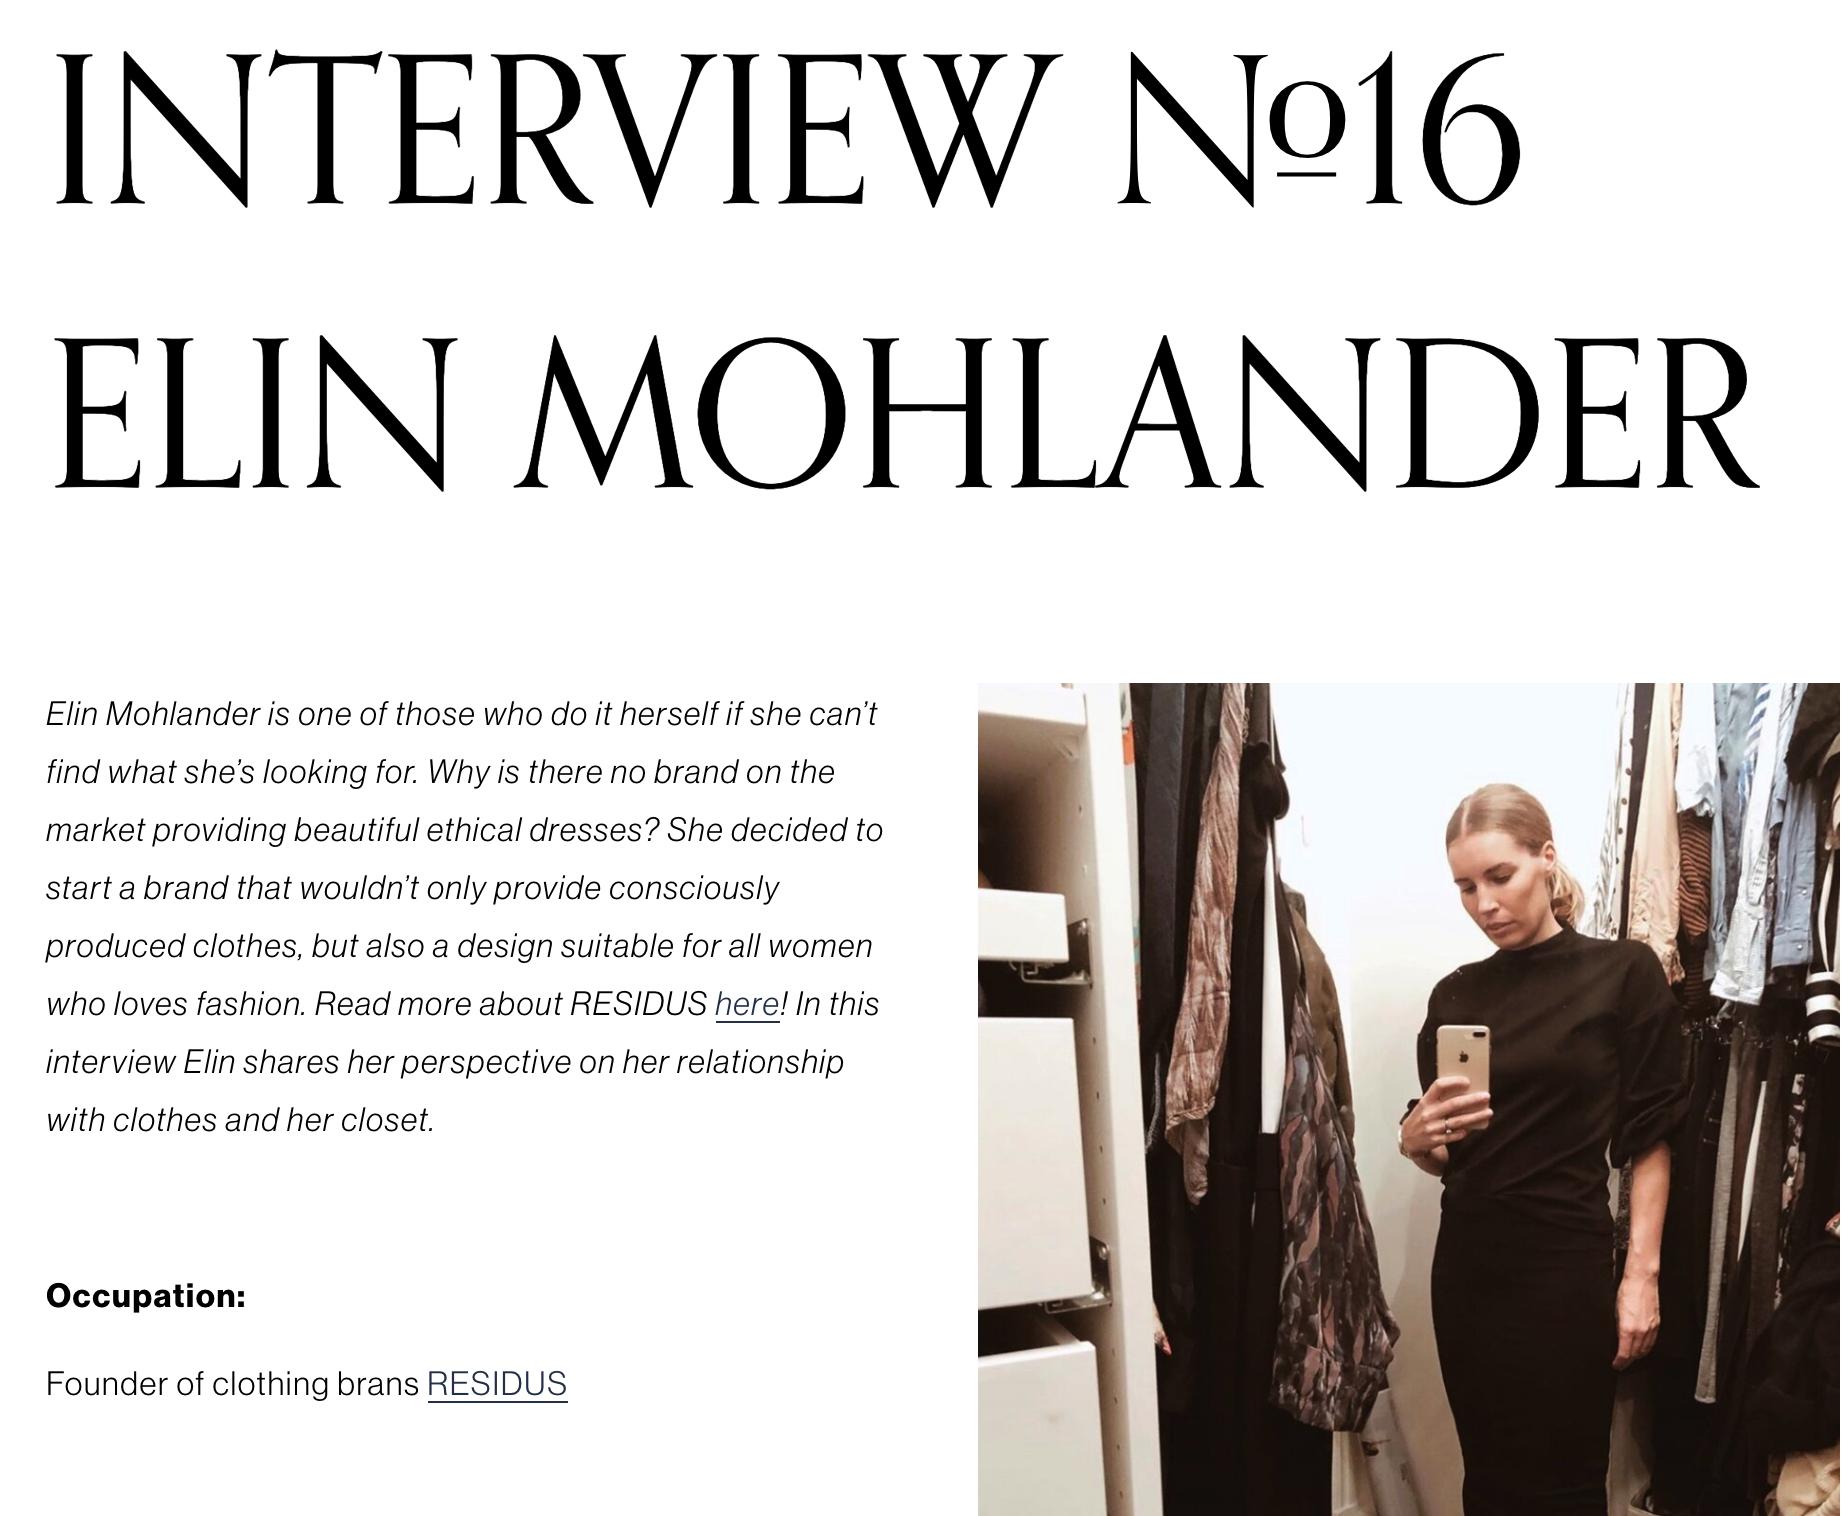 Intervju gällande en hållbar garderob